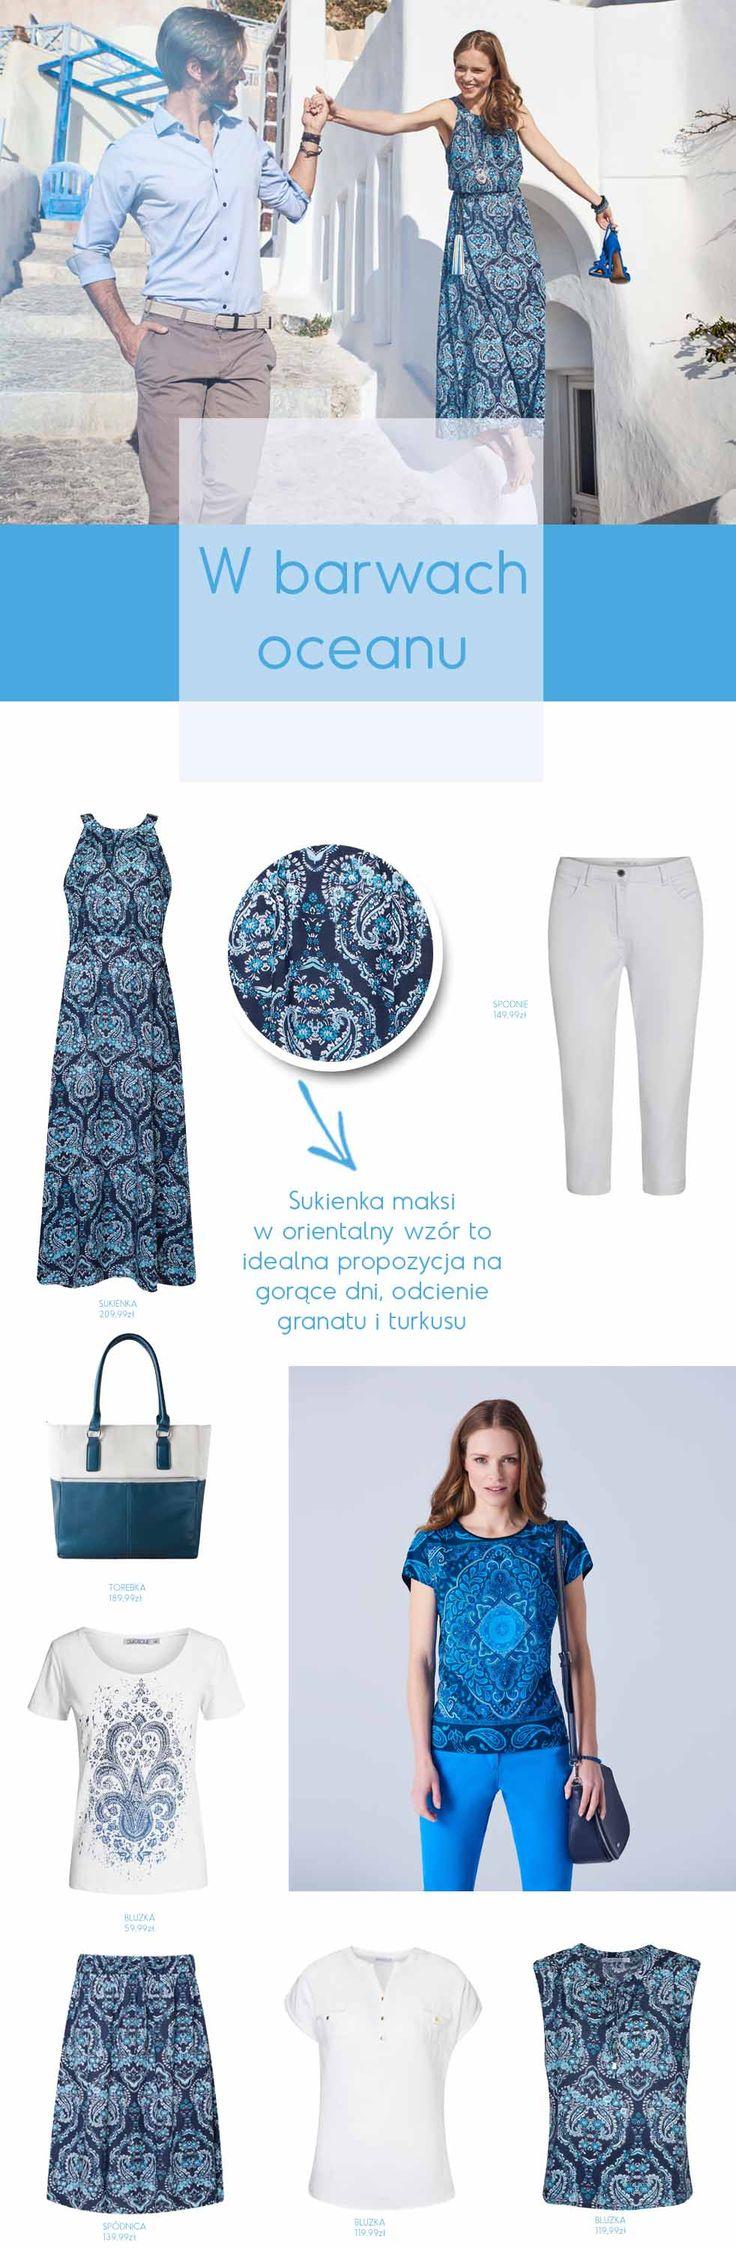 #quiosque #quiosquepl #naszainspiracja #ootd #collection #woman #lady #style #outfit #ootd #feminine #kobieco #womanwear #trends #inspirations #fashion #polishfashion #polishbrand